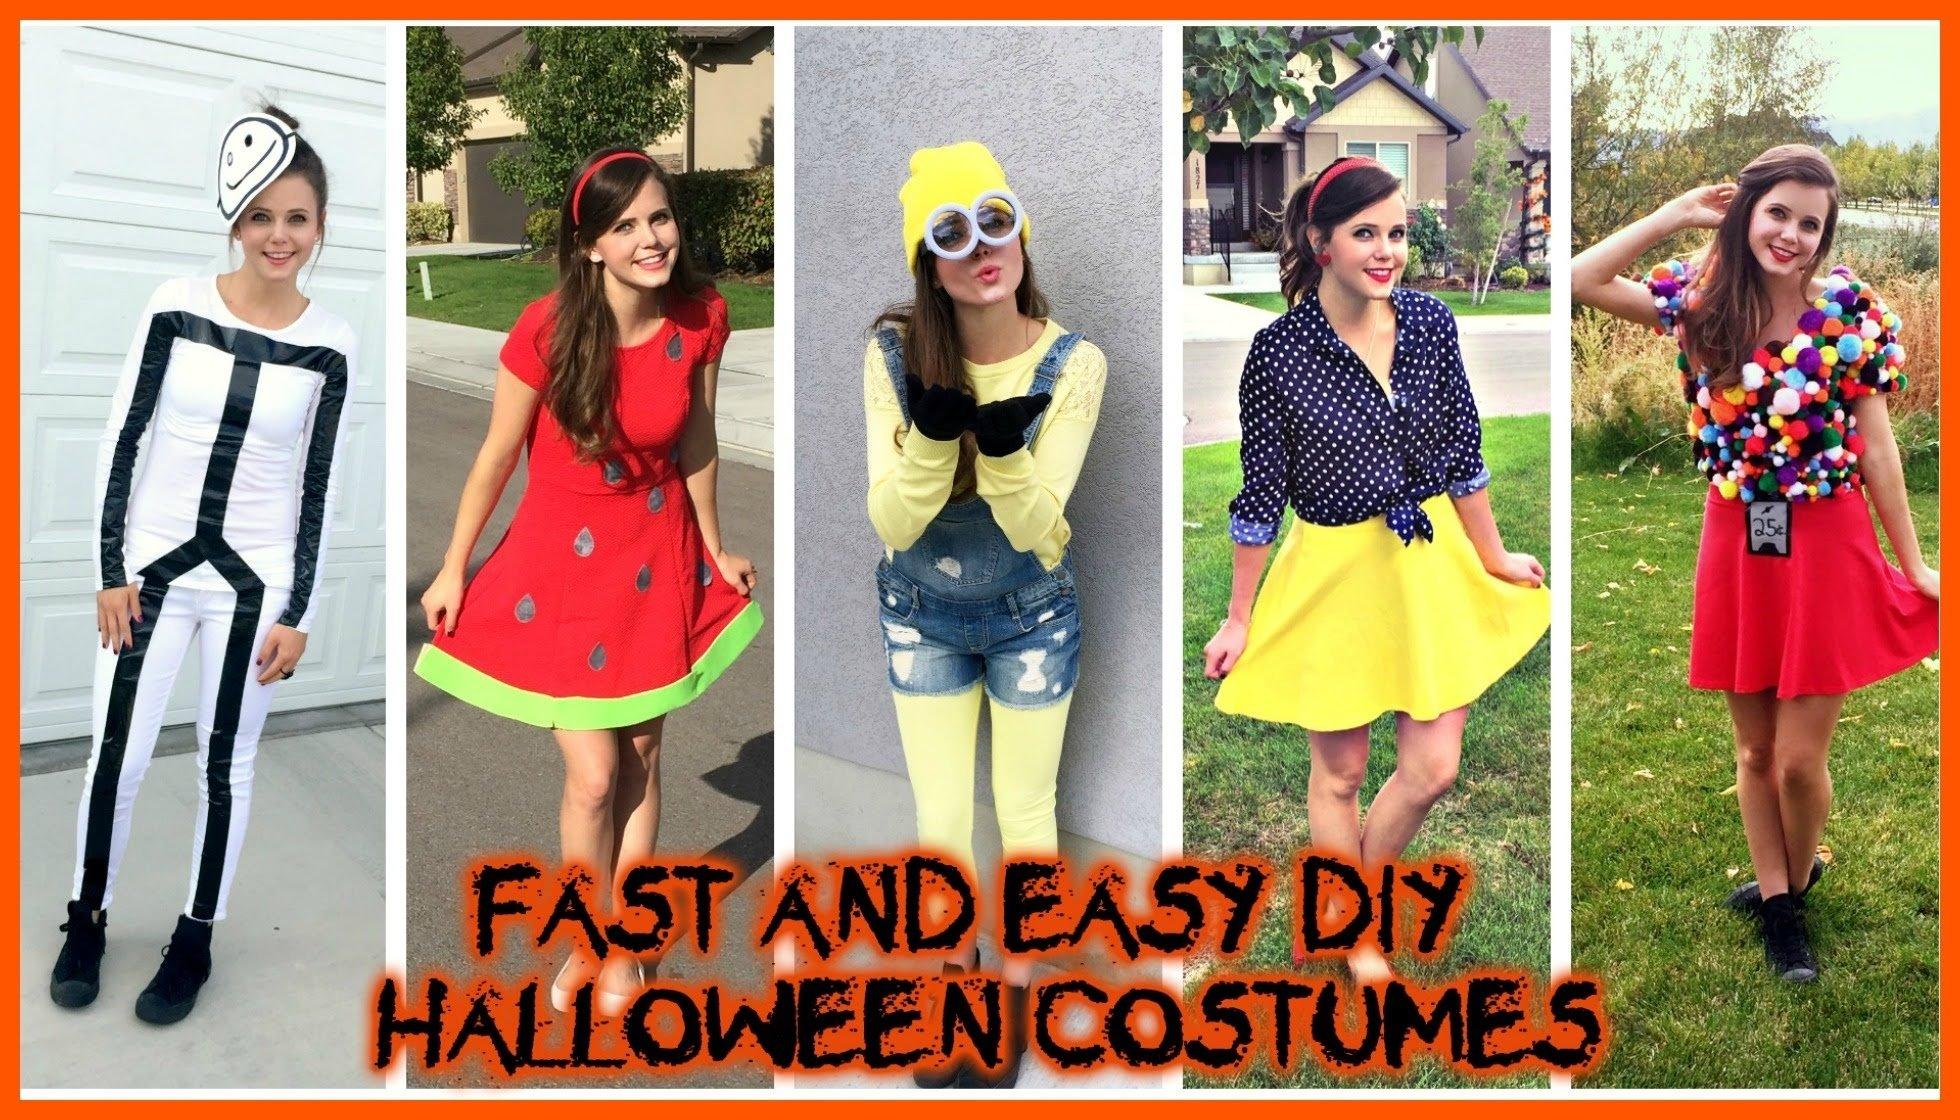 10 Amazing Last Minute Homemade Costume Ideas diy halloween costumes super easy cheap last minute ideas tiffany 4 2021